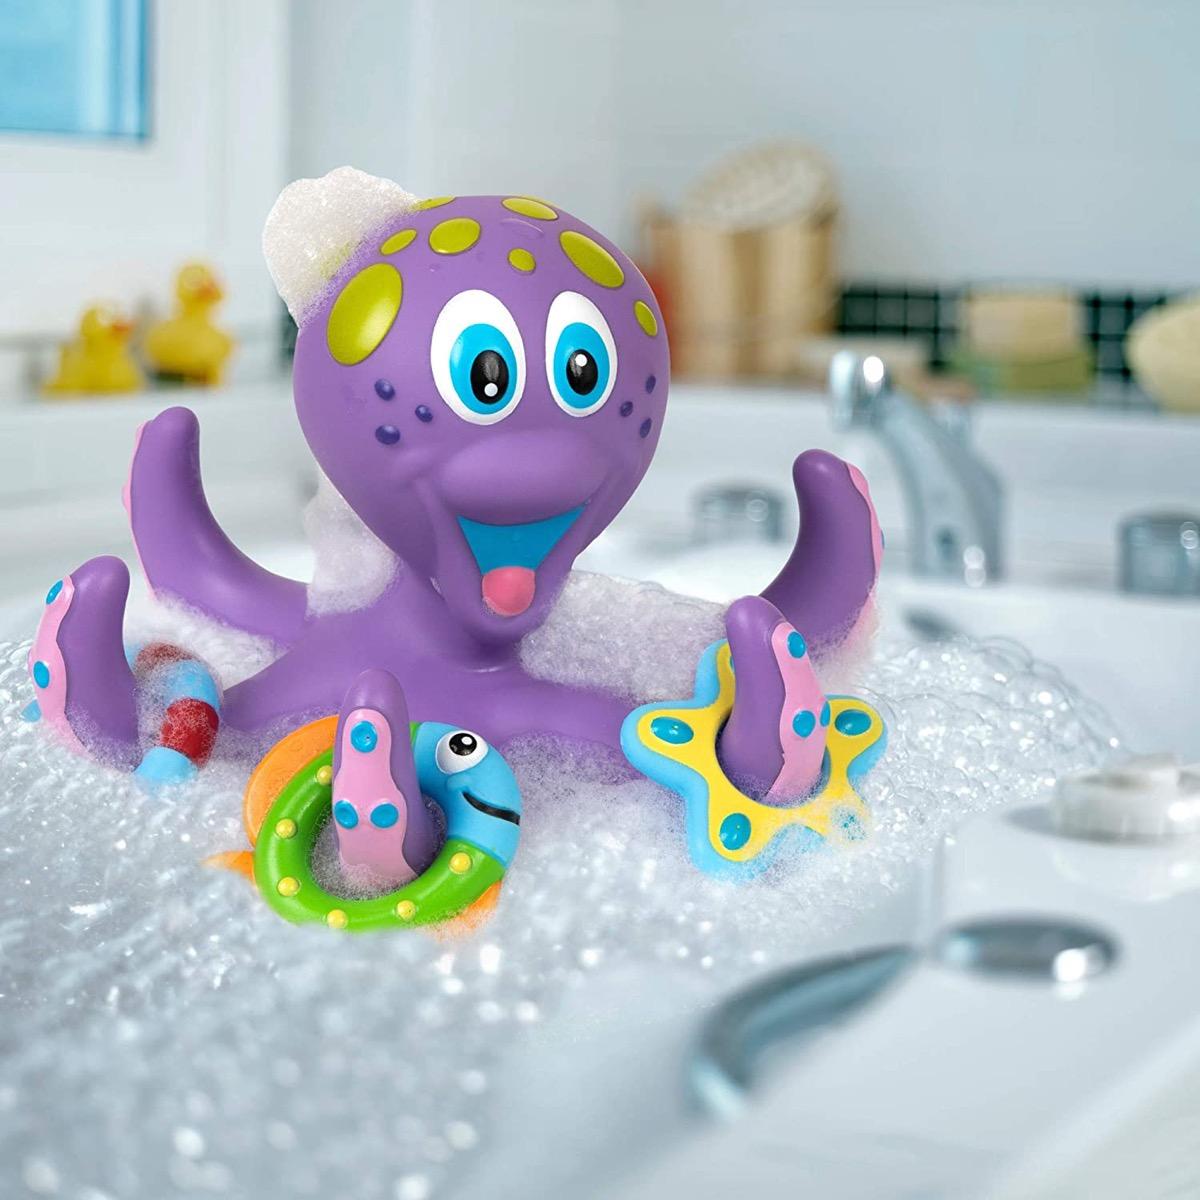 purple bath octopus